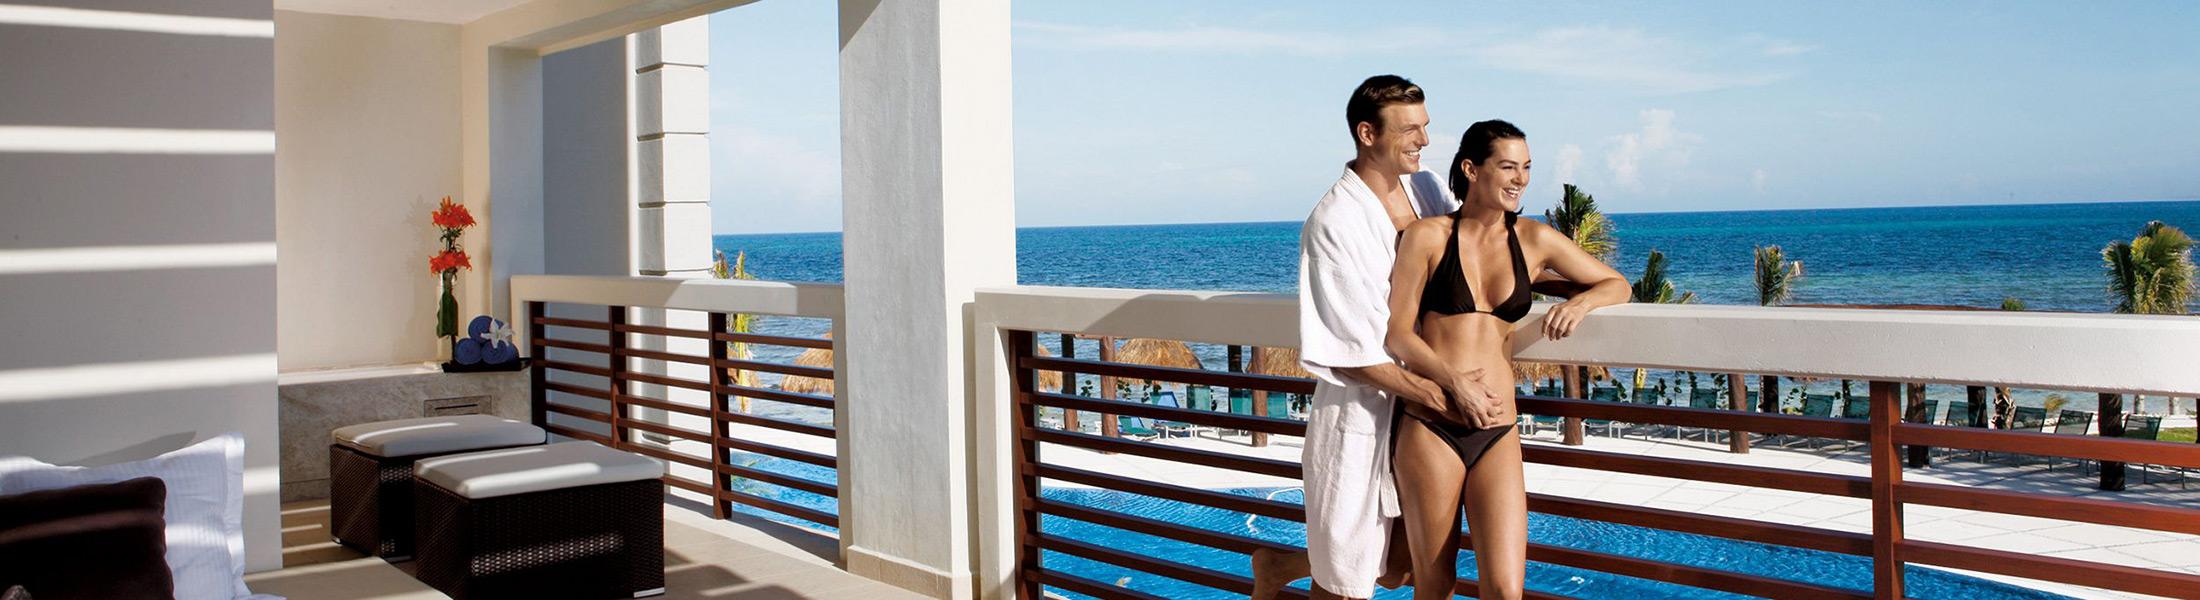 Couple on the balcony overlooking the ocean